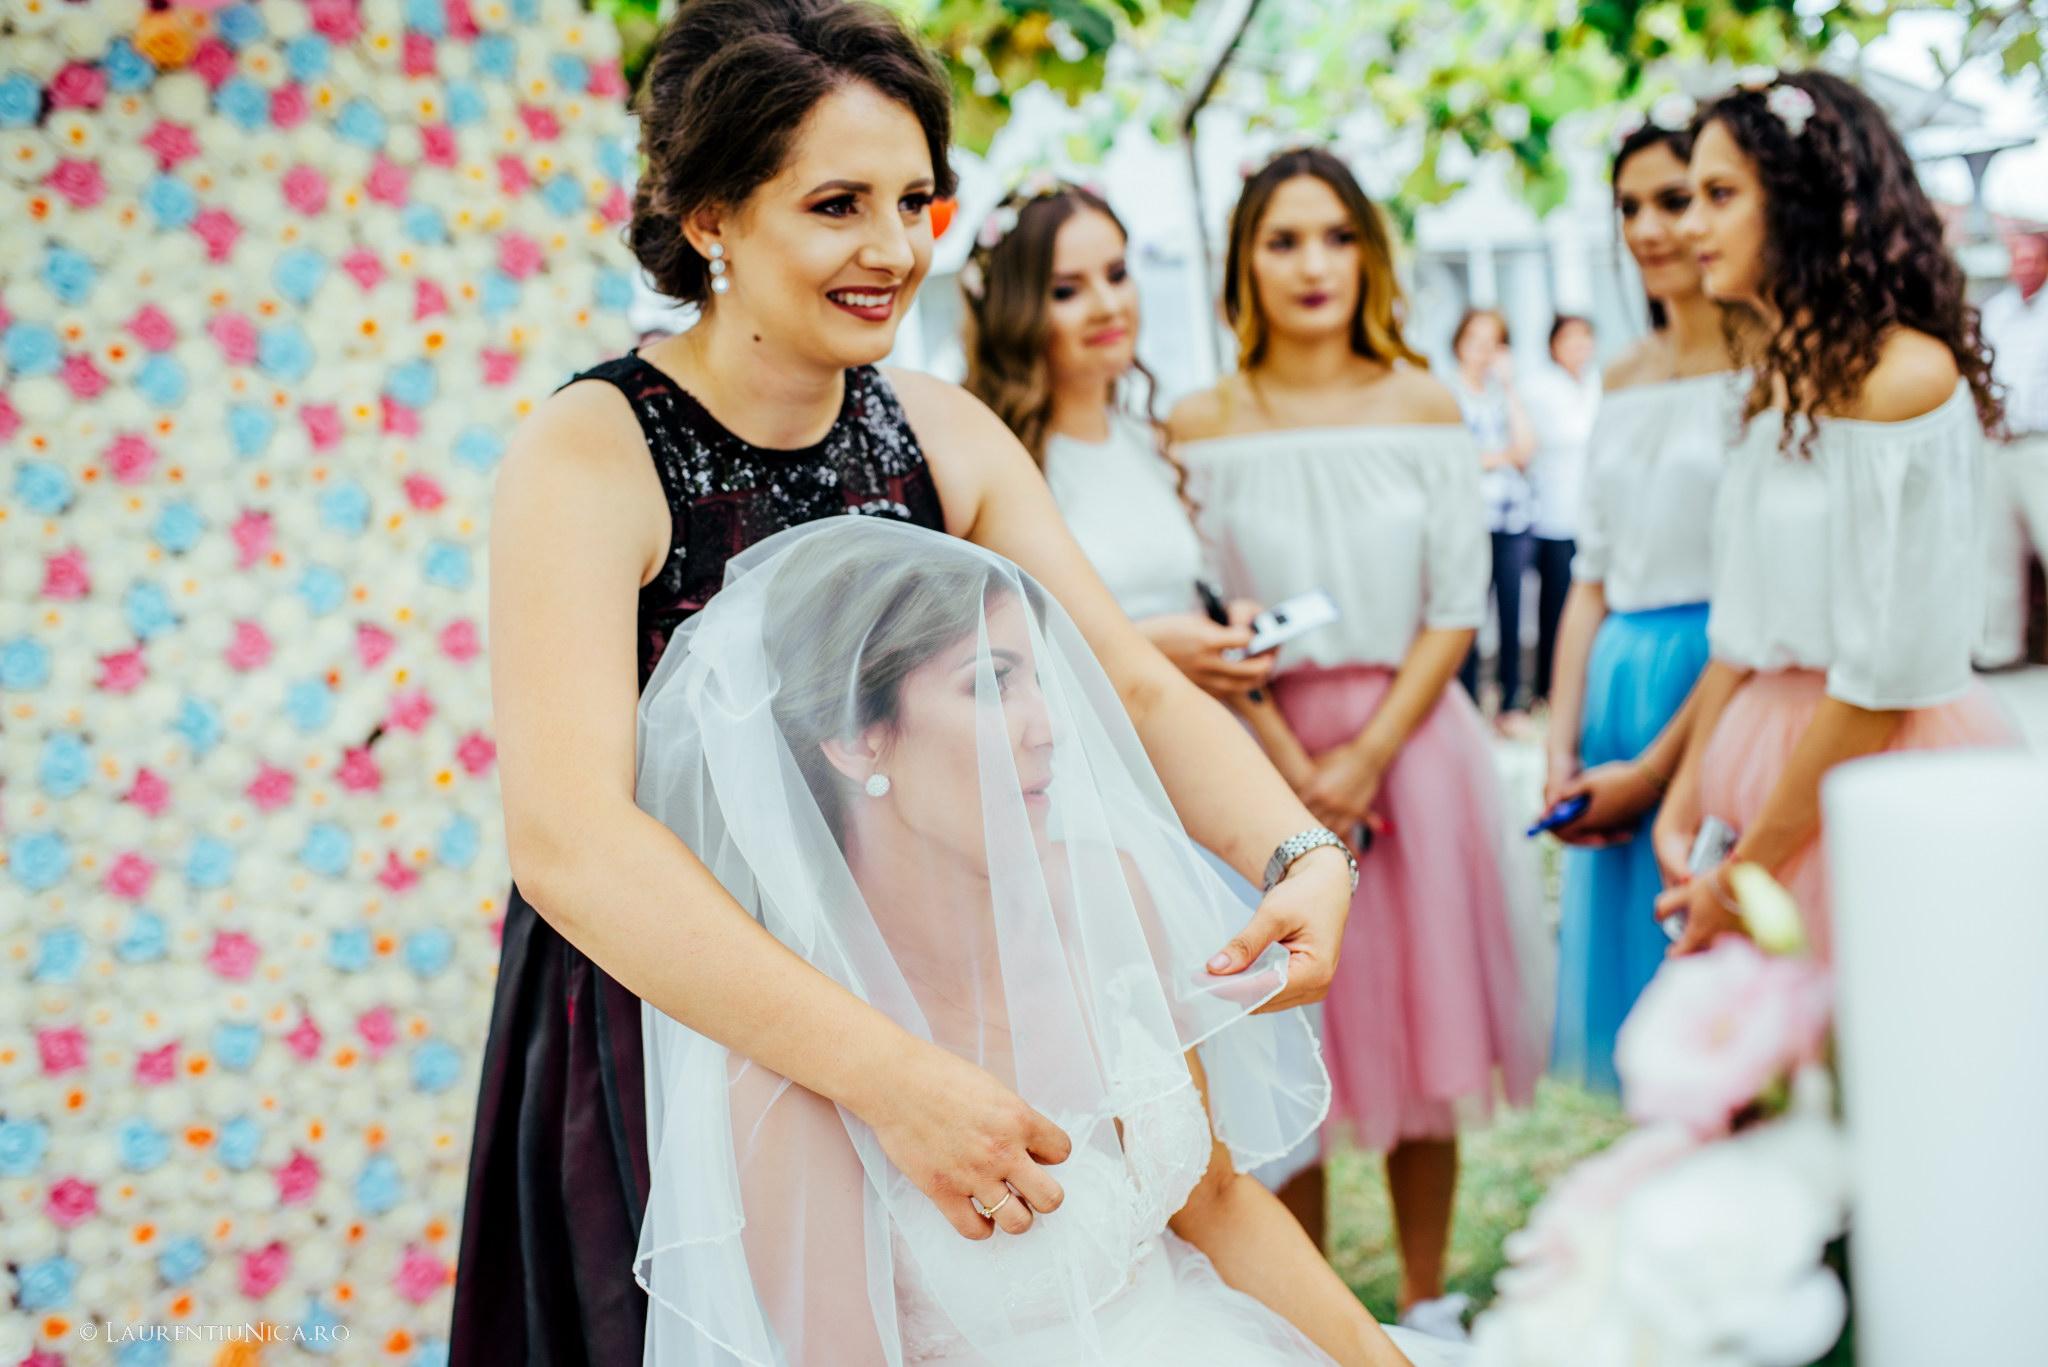 madalina madalin fotograf nunta laurentiu nica turceni gorj 13 - Madalina & Madalin | Fotografii nunta | Judetul Gorj